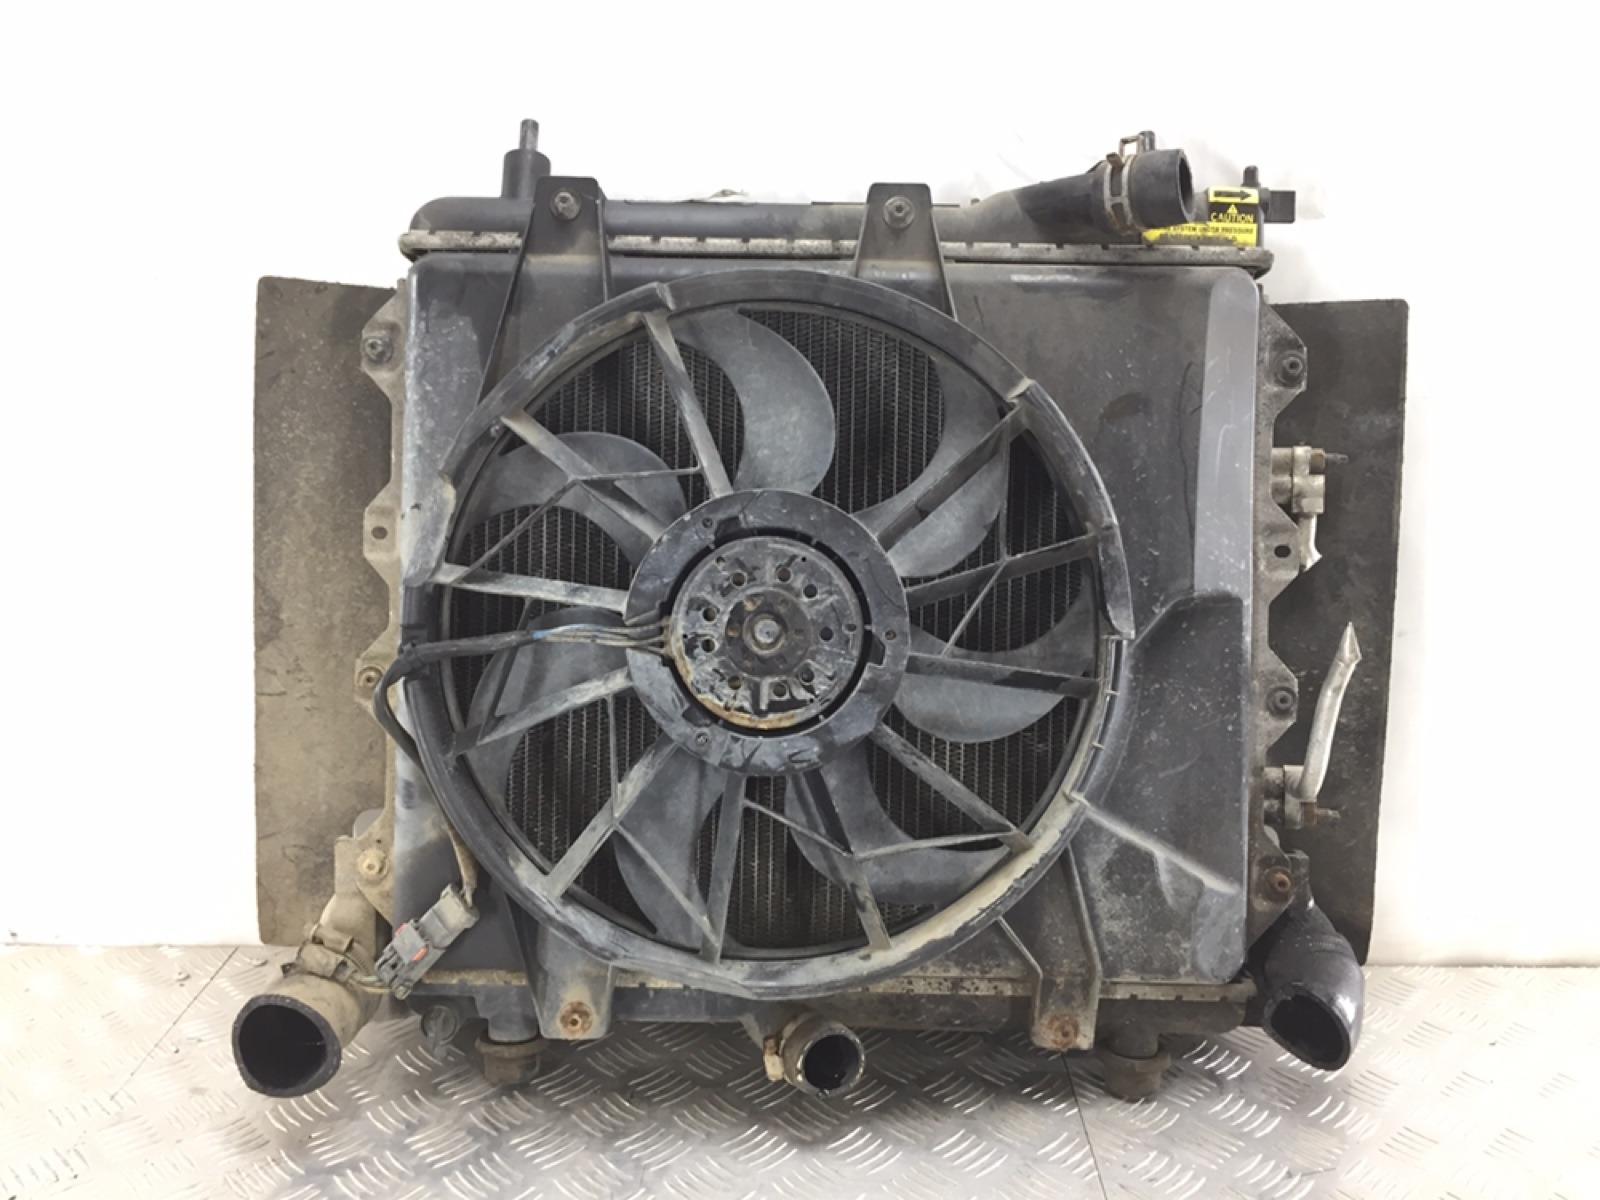 Кассета радиаторов Chrysler Pt-Cruiser 2.2 CRD 2005 (б/у)